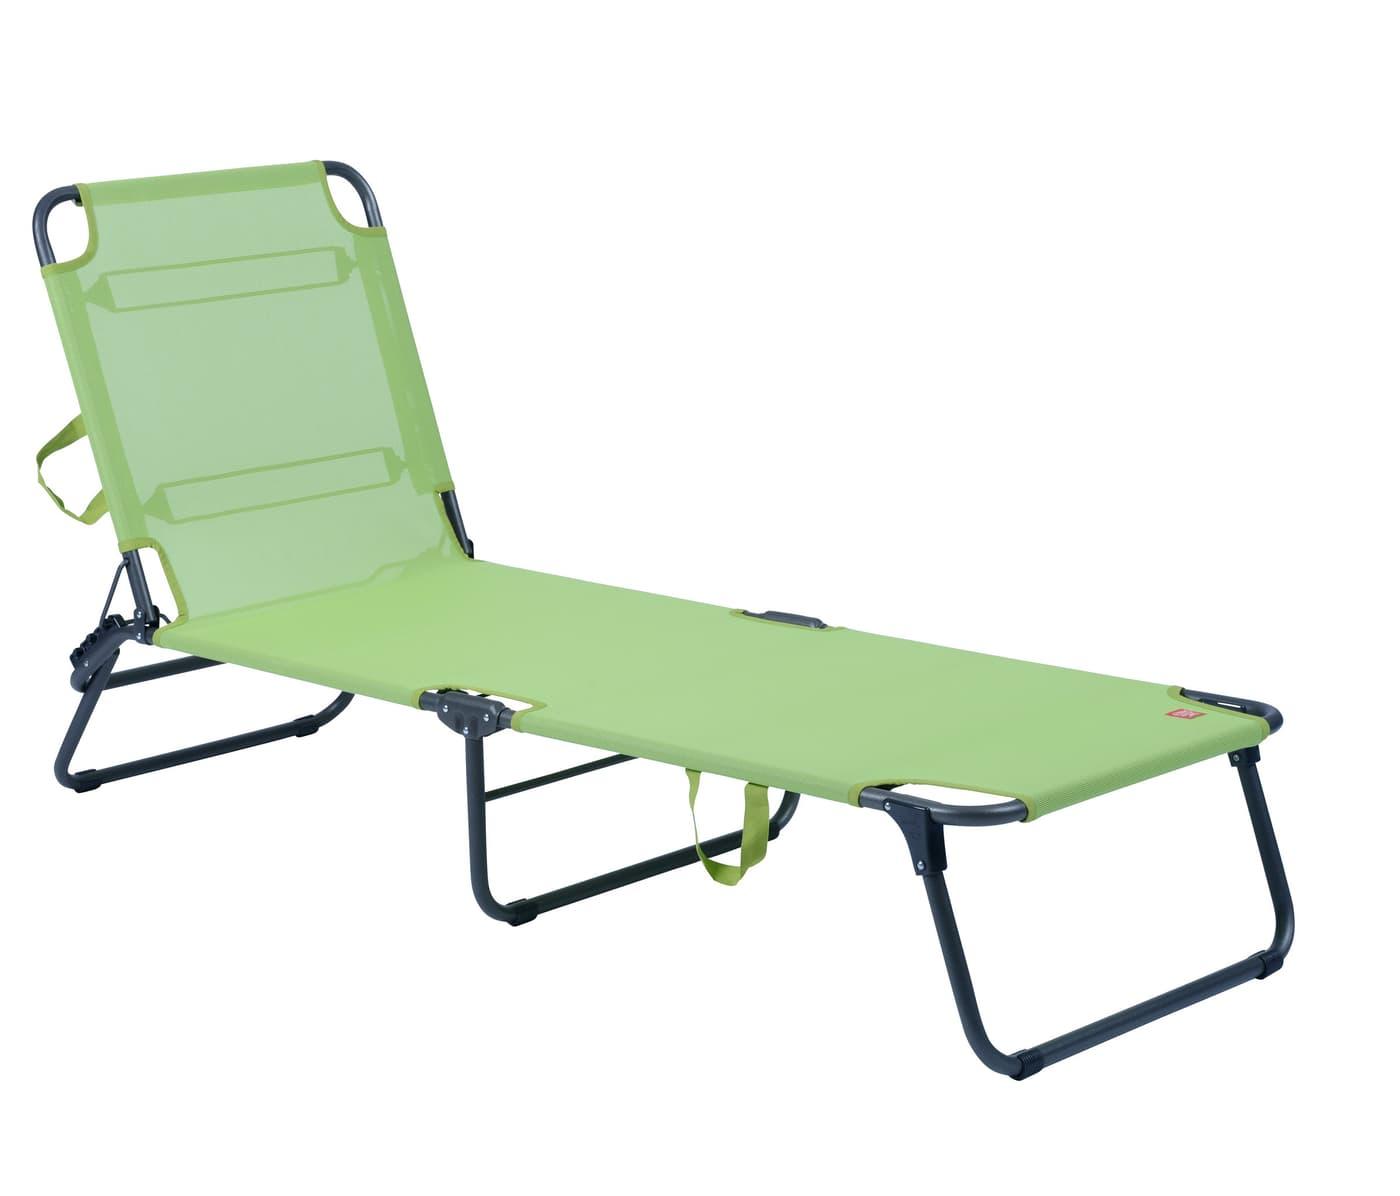 lit de camp amigo 135 tx migros. Black Bedroom Furniture Sets. Home Design Ideas